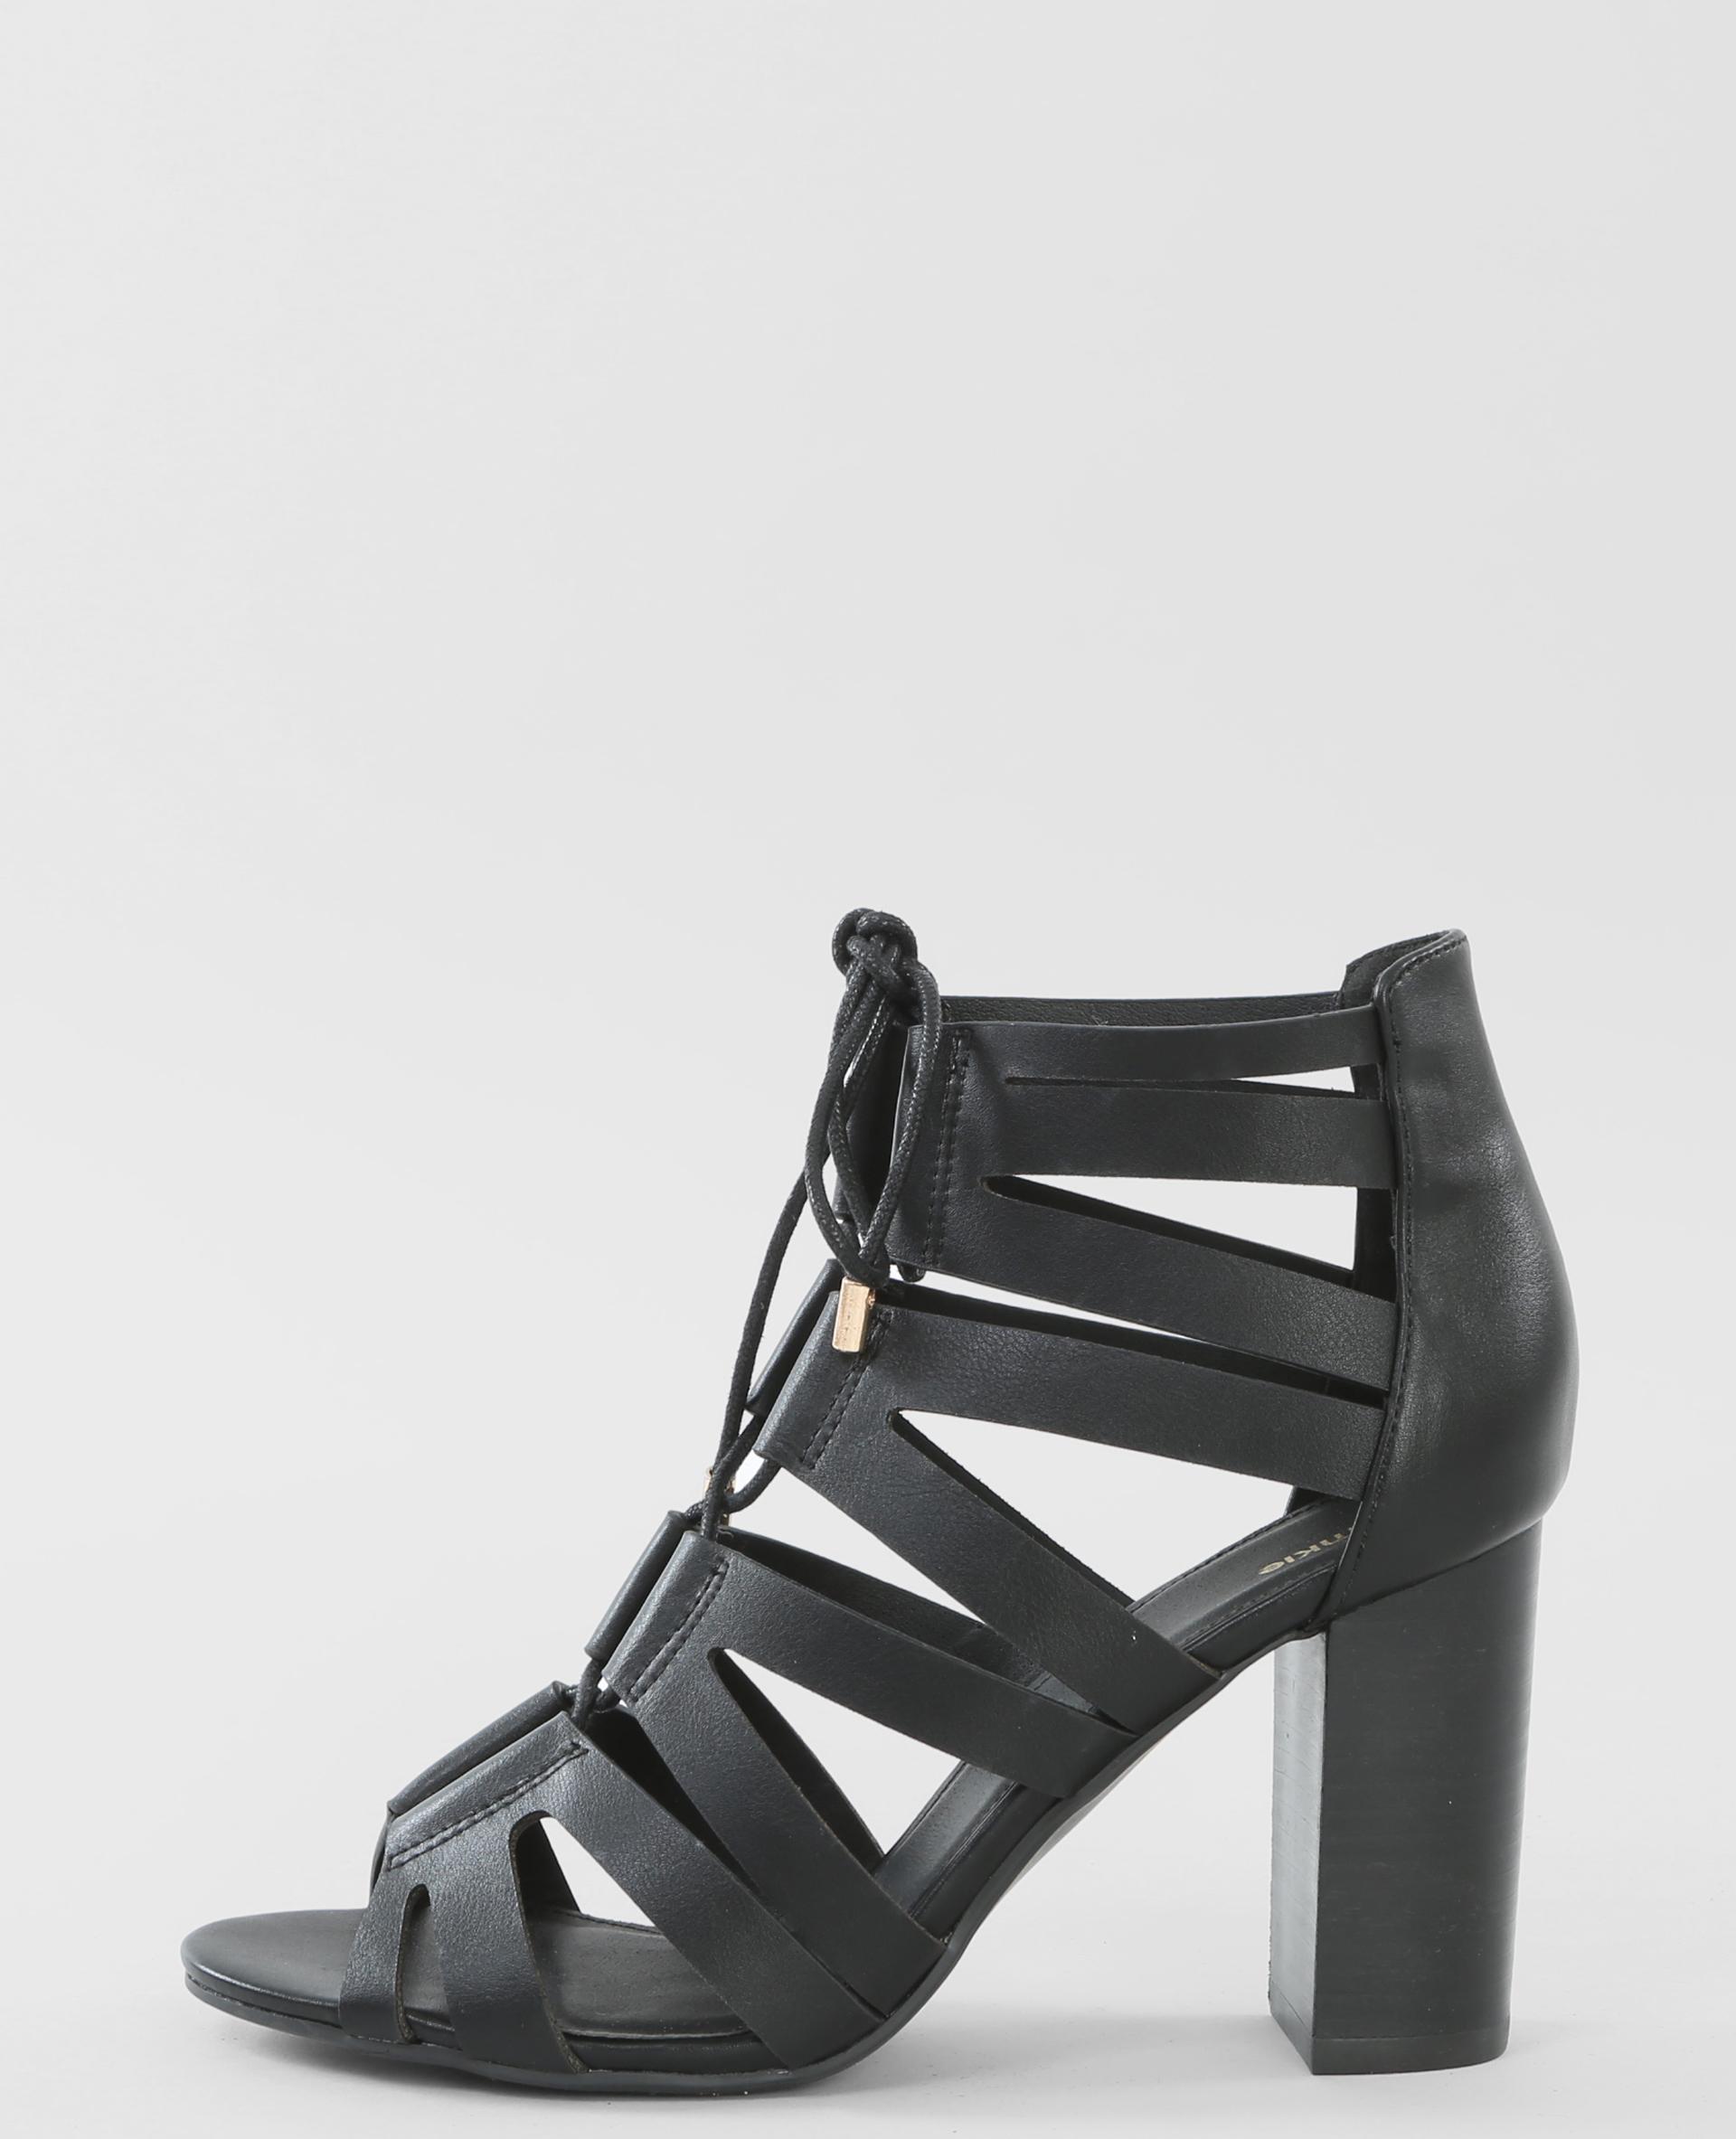 sandales talon noir 988078899a08 pimkie. Black Bedroom Furniture Sets. Home Design Ideas